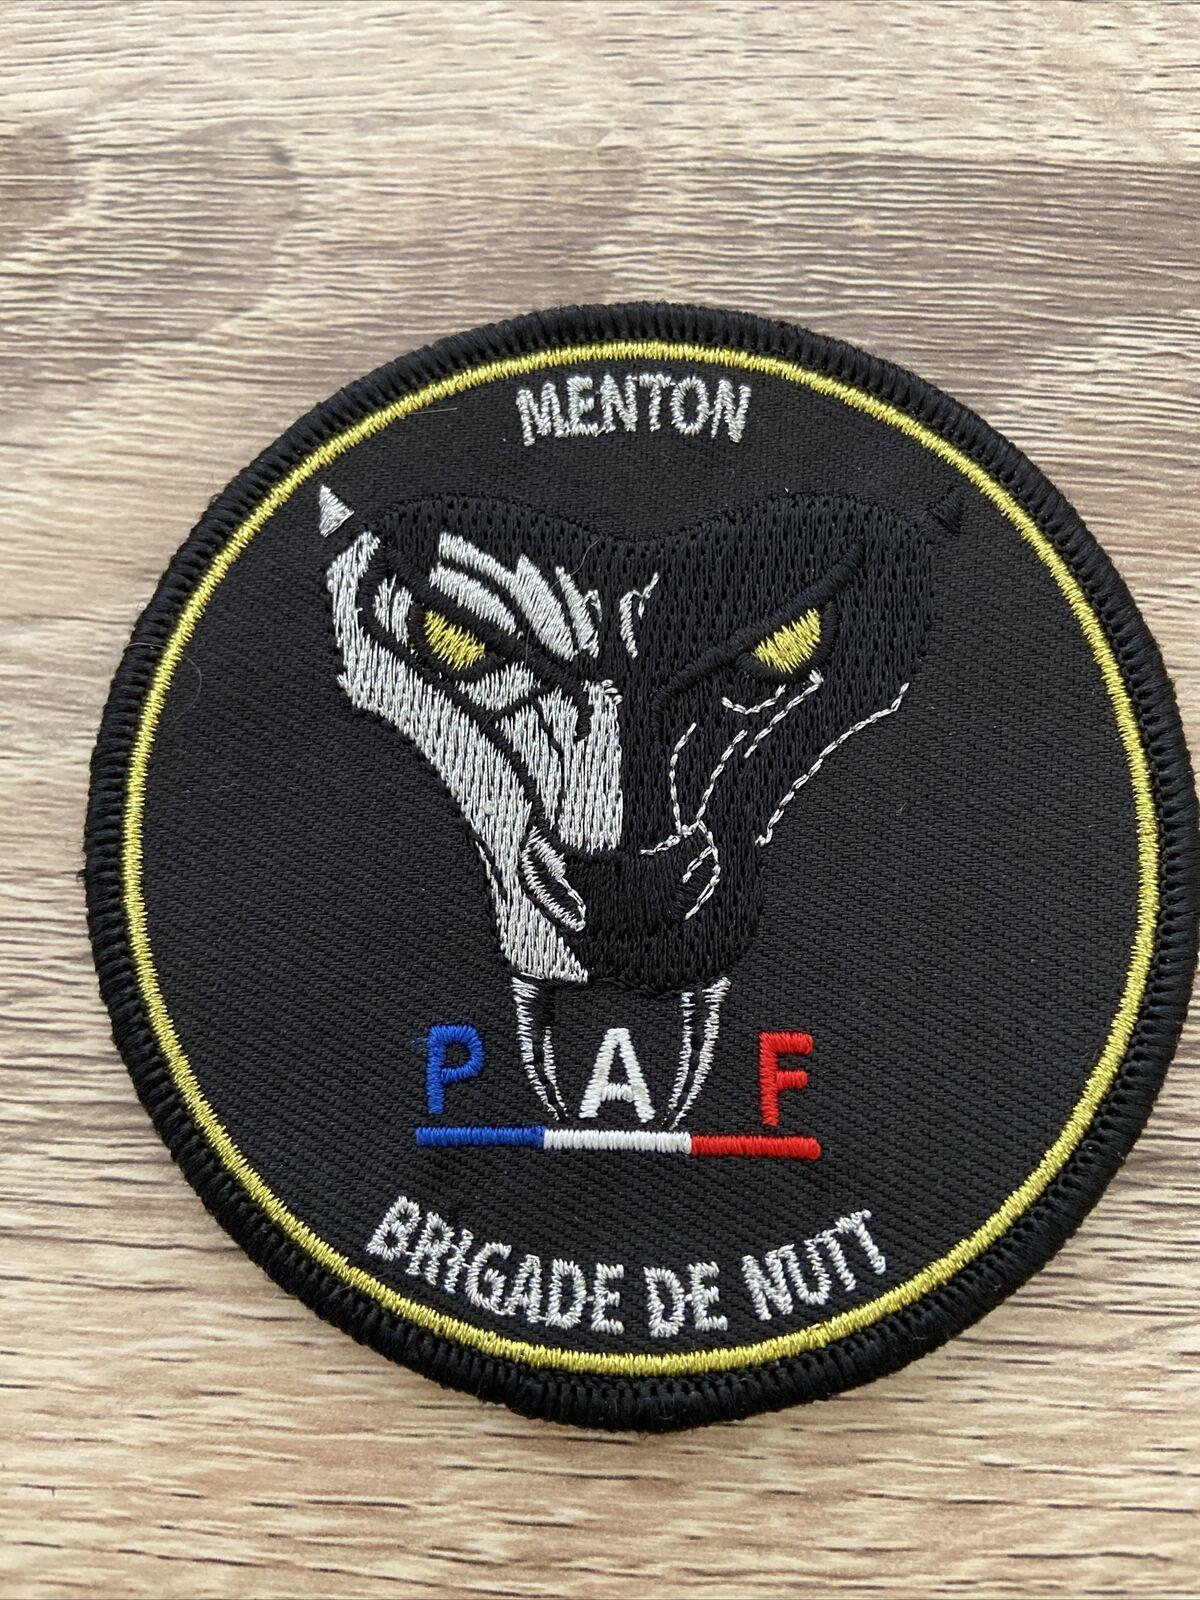 Ecusson Police Nationale - PAF Menton Brigade Nuit